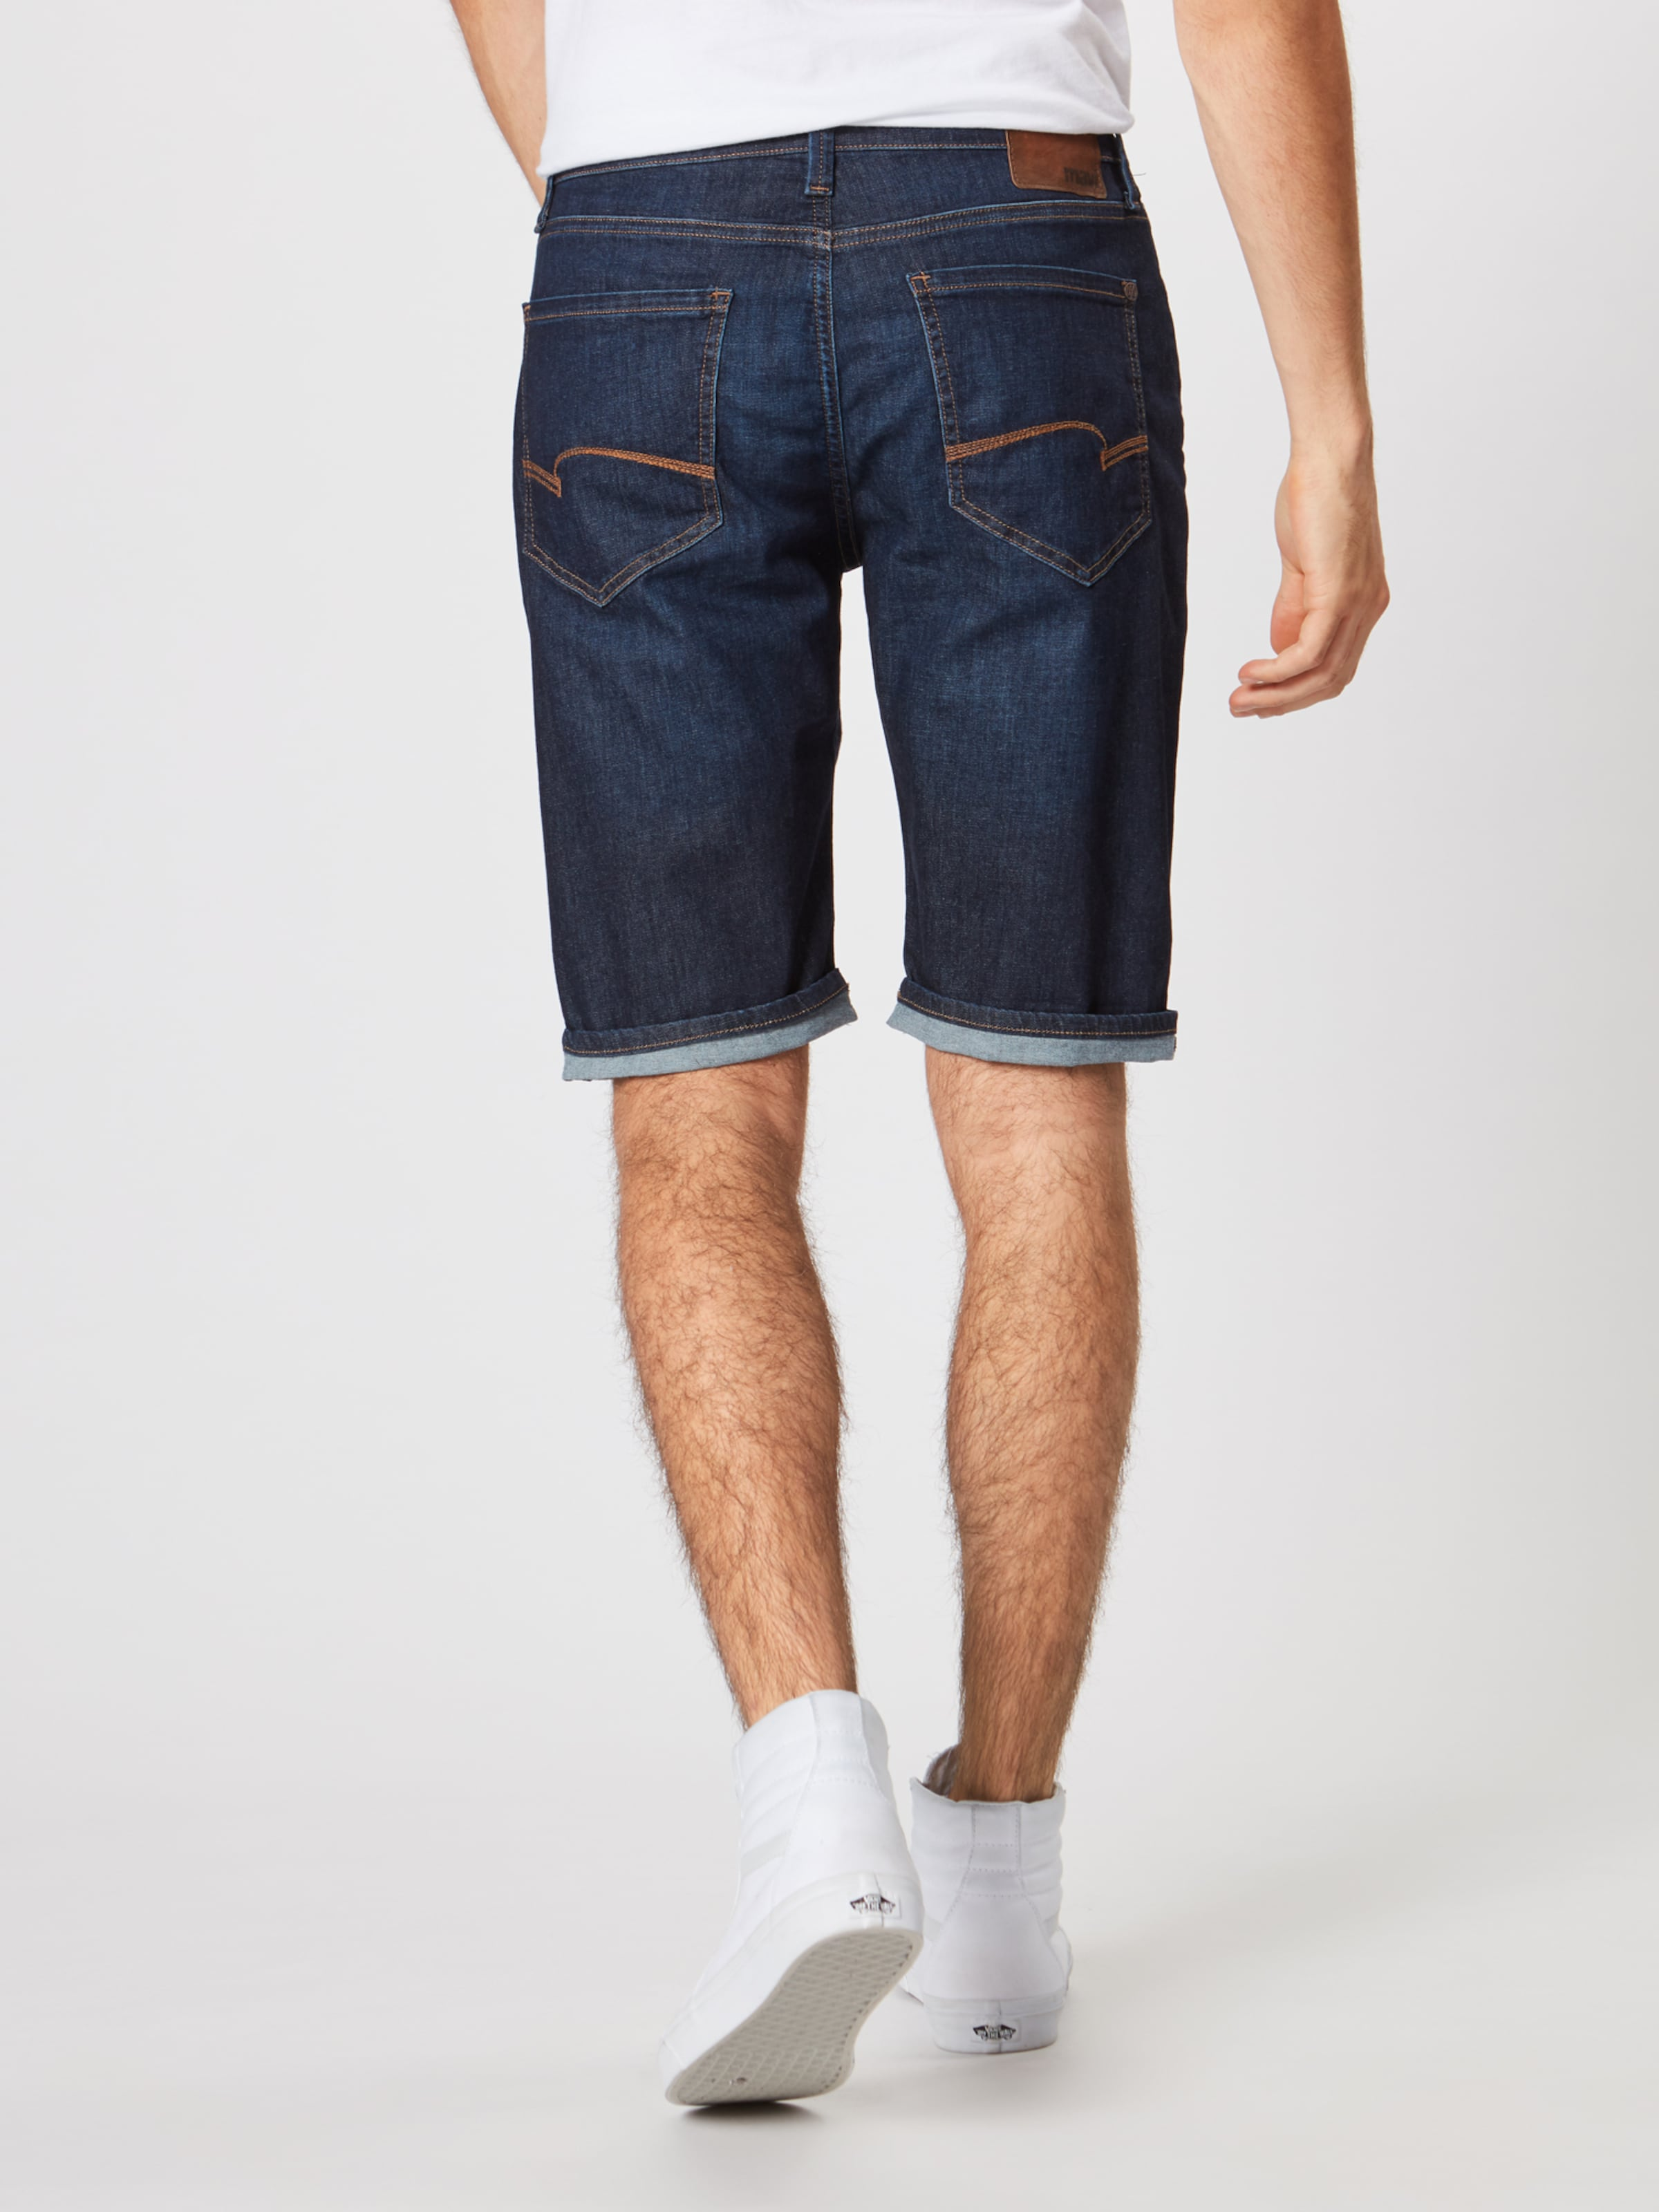 In Jeans Blue Denim 'wylie' Mavi rdCoeBx